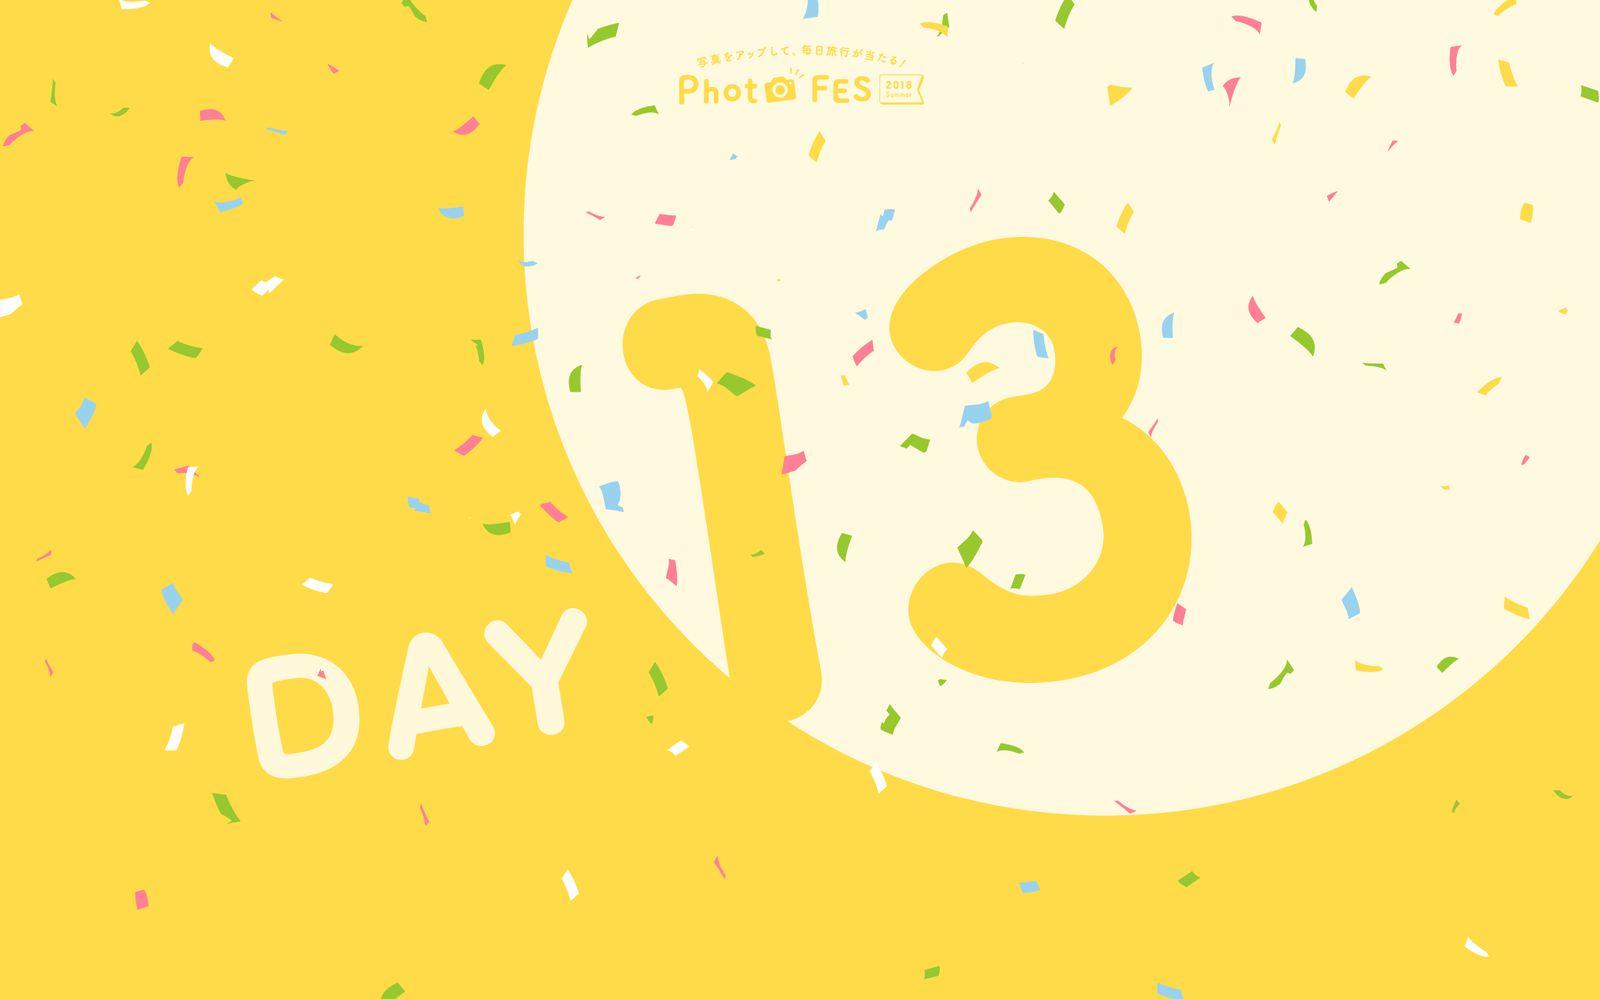 【DAY13】「Photo FES 2018」7月8日投稿分であたる賞品&受賞者発表